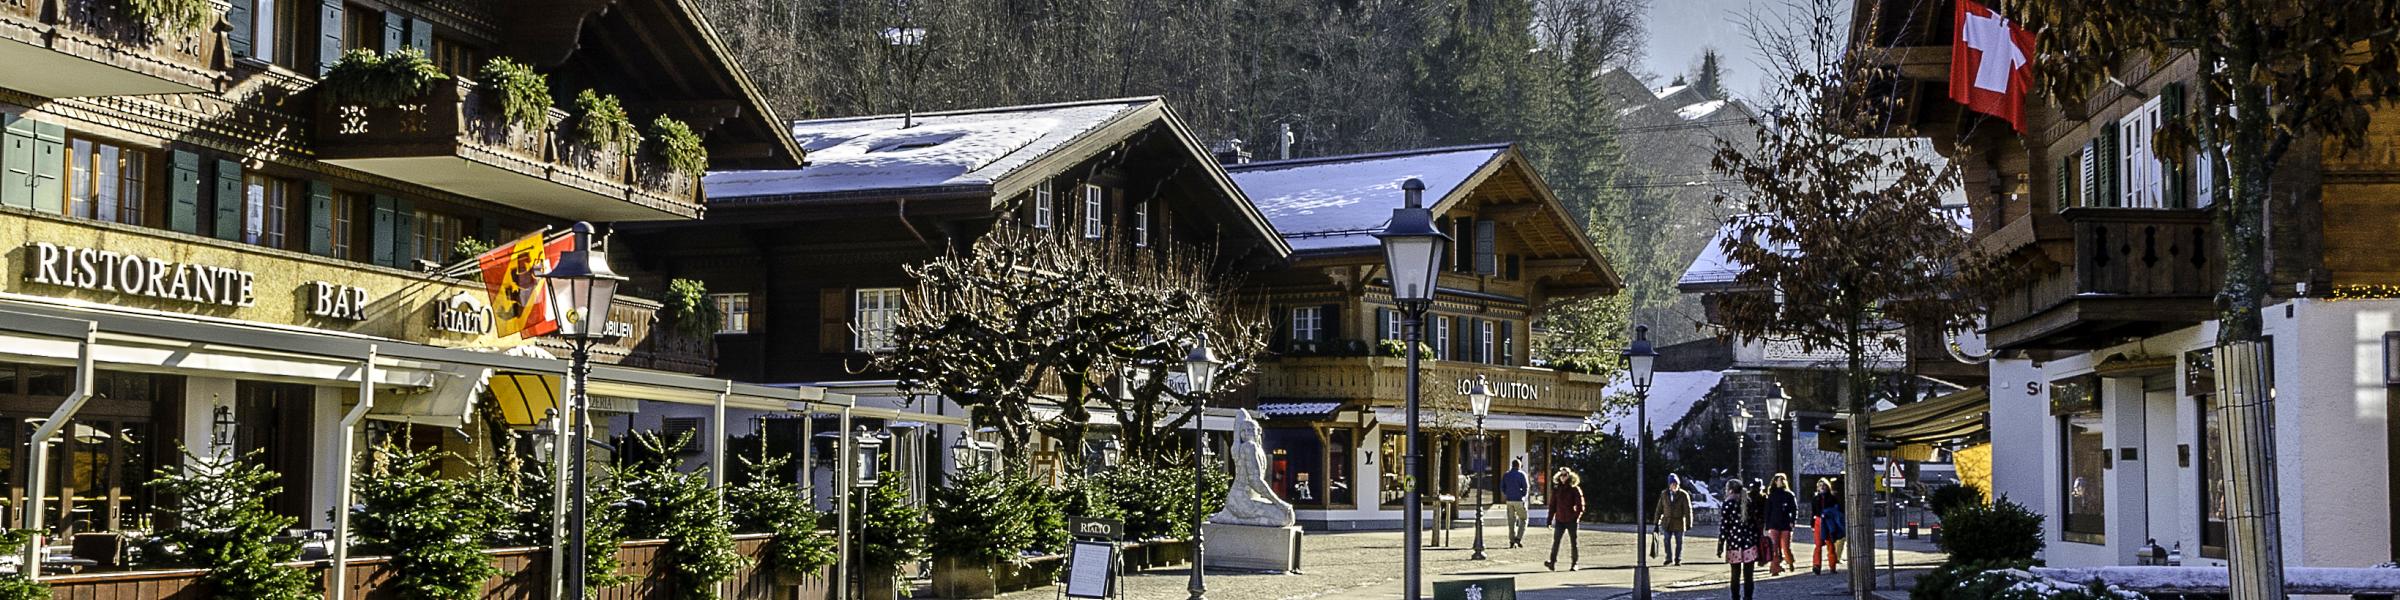 Main street of Gstaad